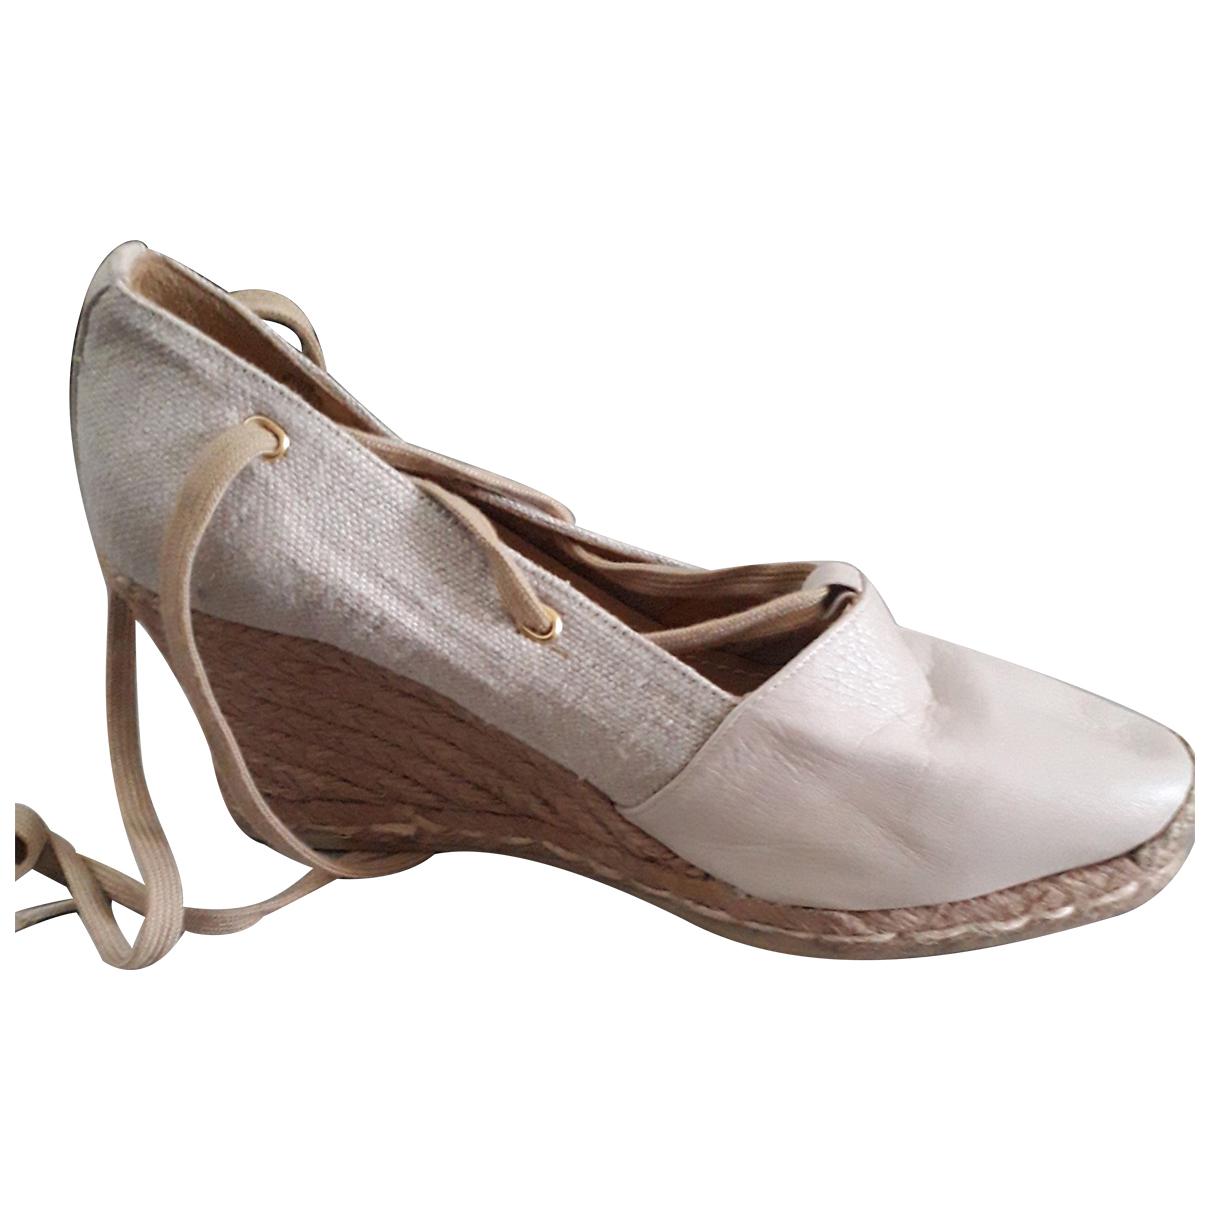 Maliparmi \N Beige Cloth Sandals for Women 37 EU